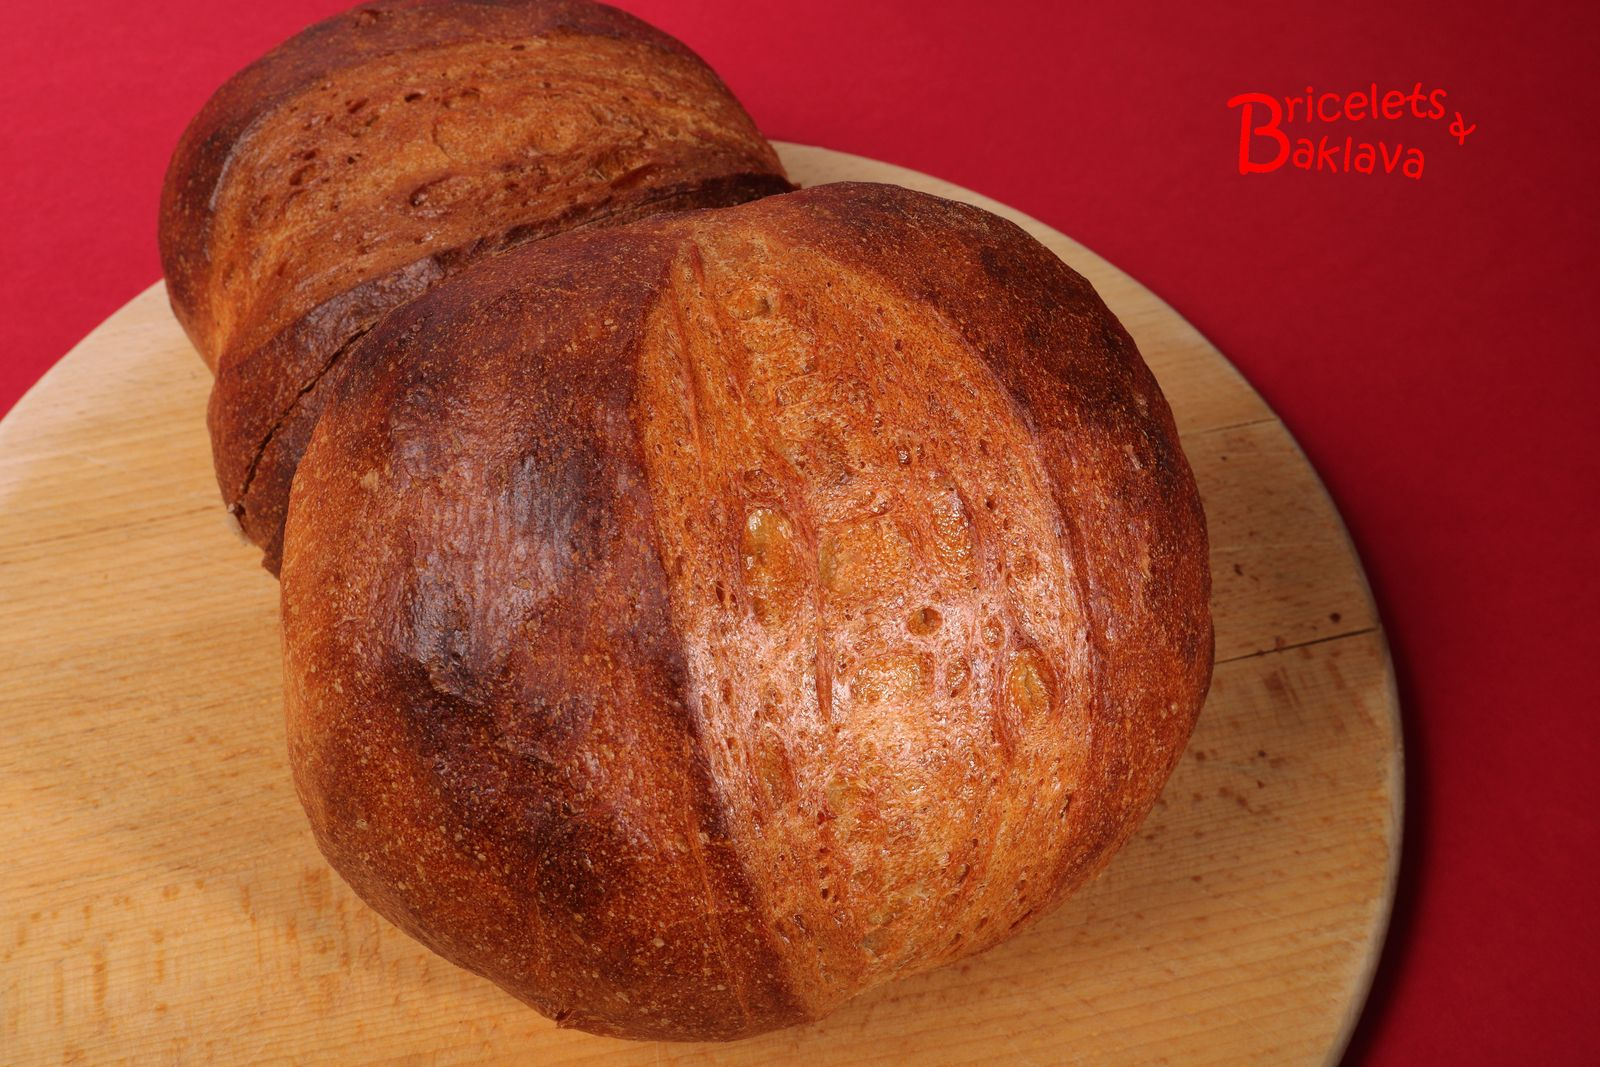 Le pain rond de Nidwald (Nidwaldnerbrot)